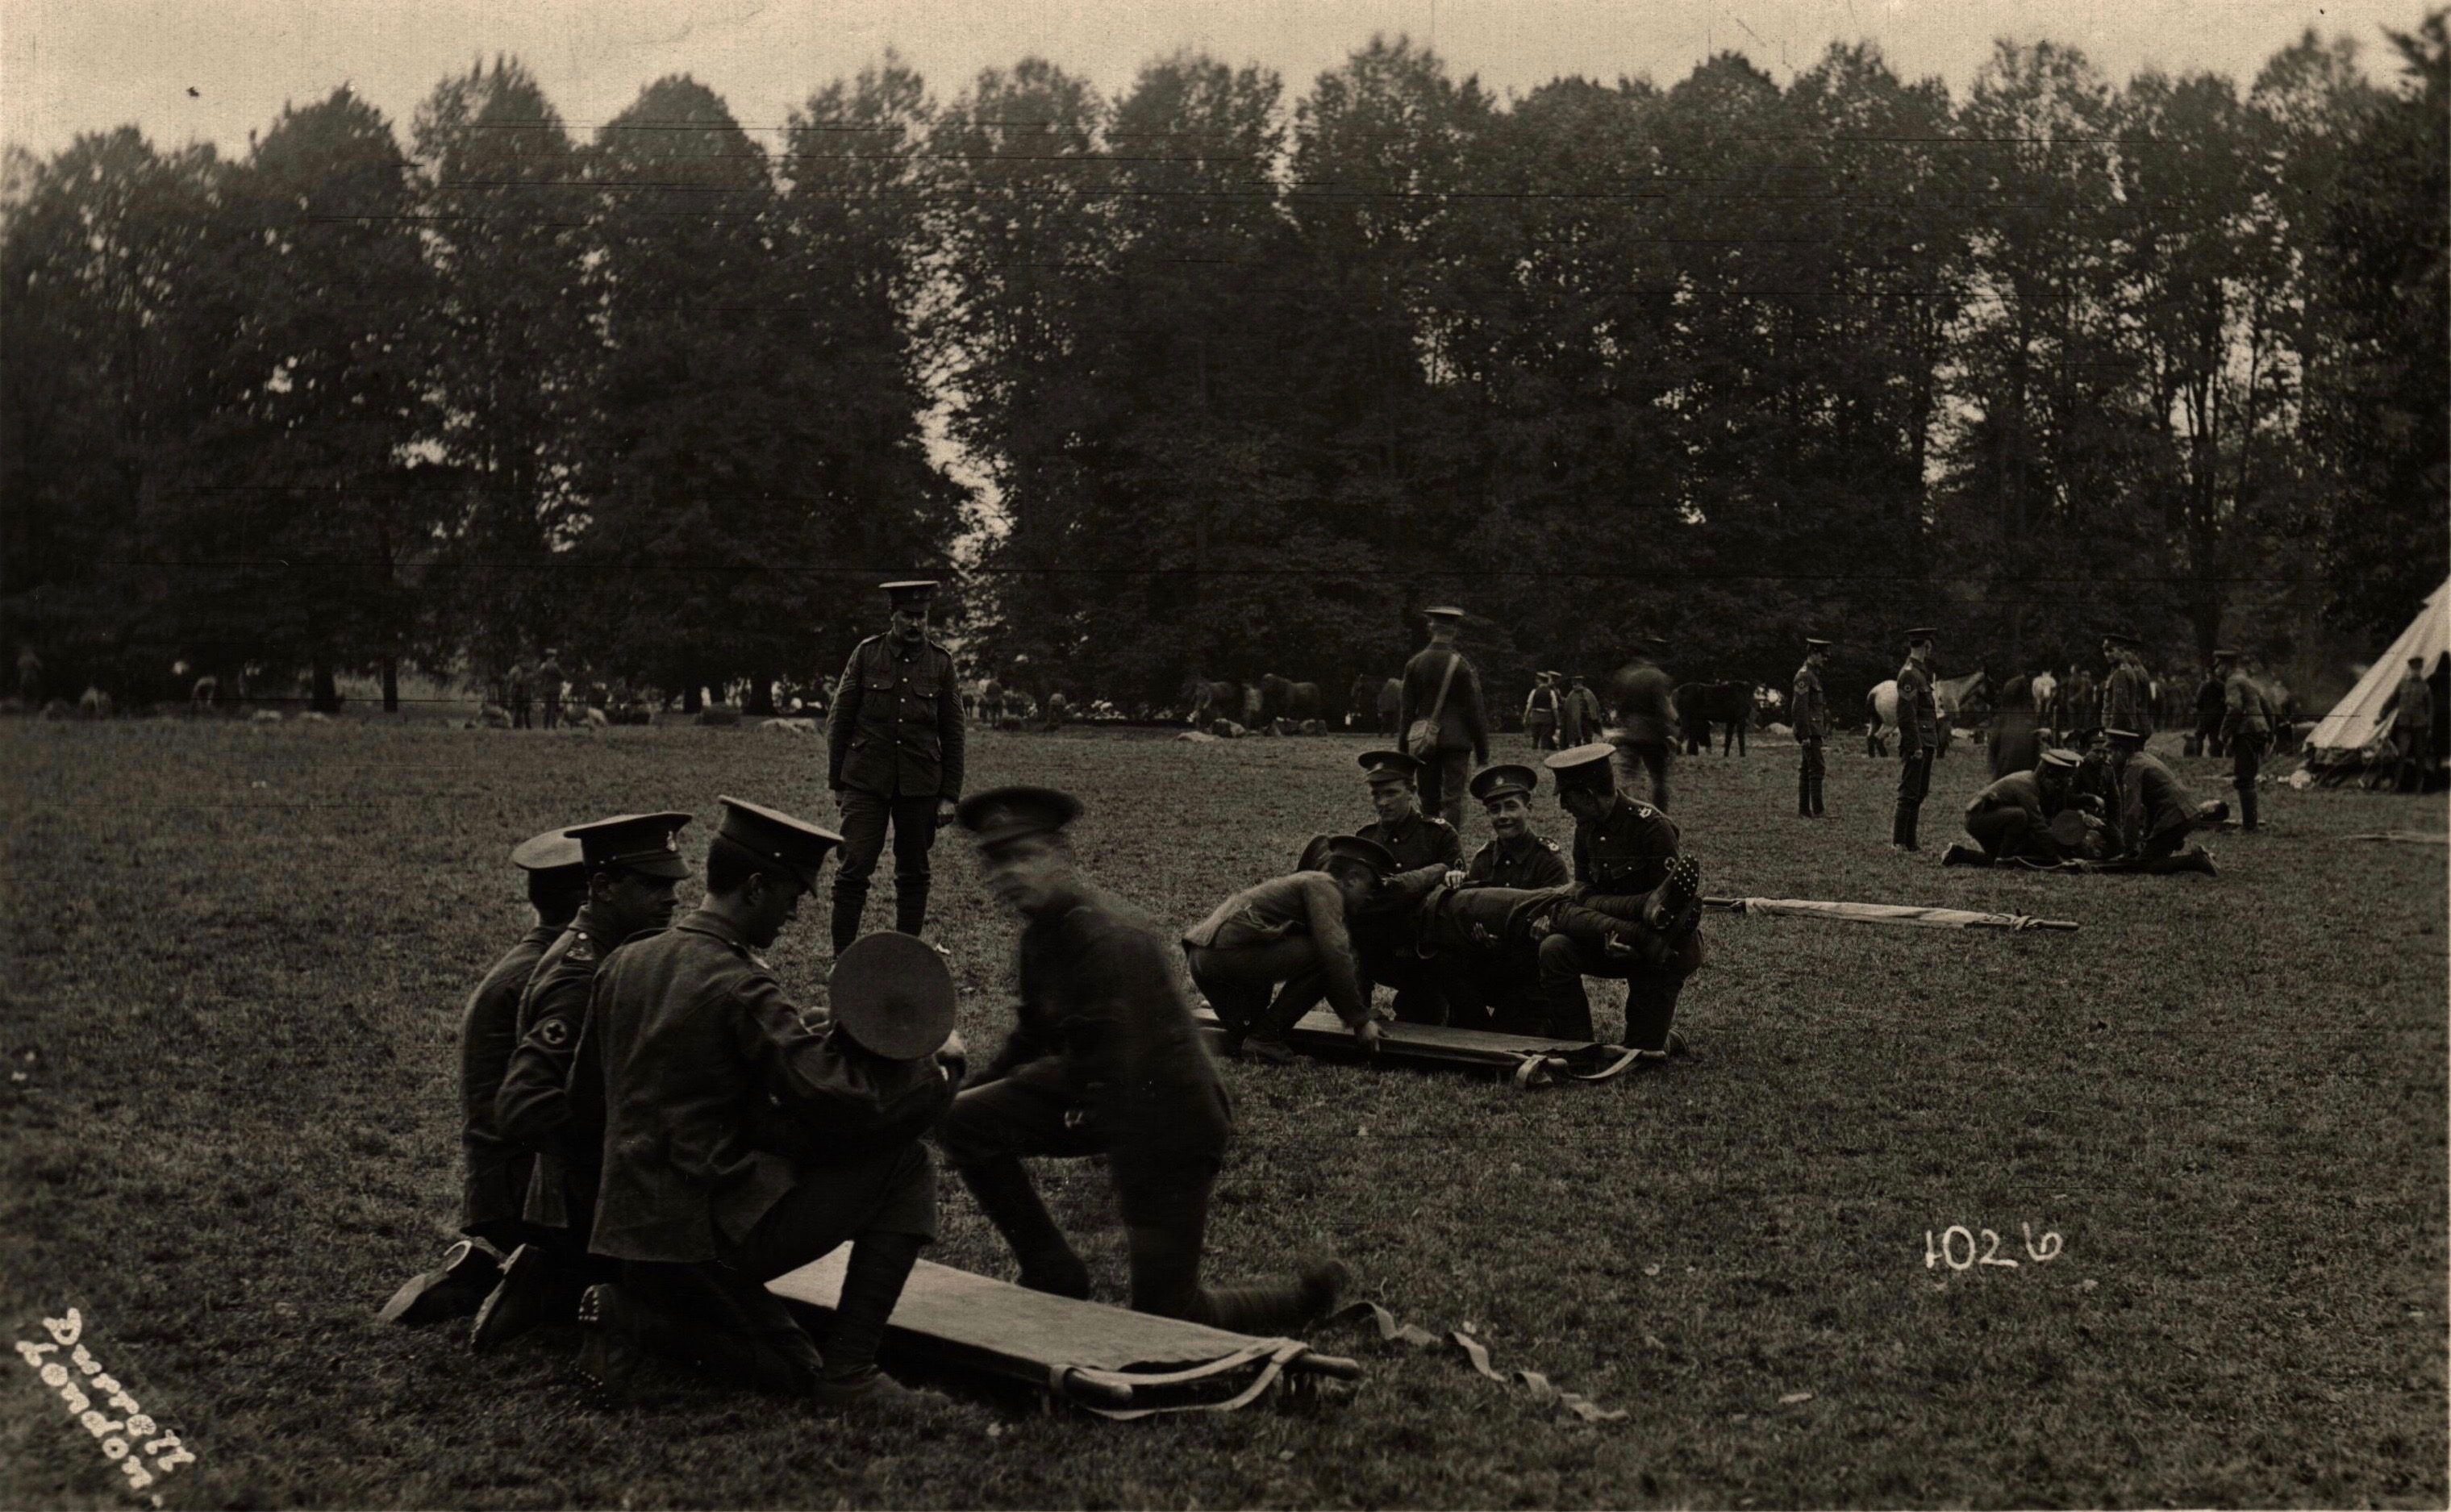 maresfield-park-army-camp-4